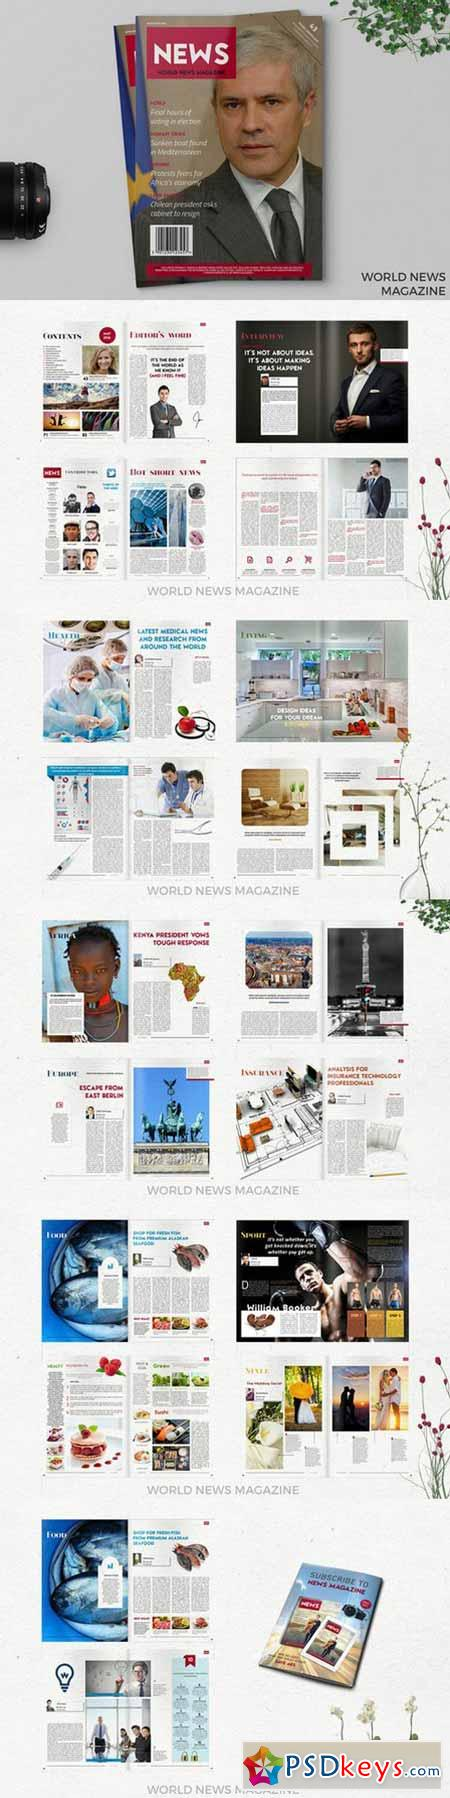 News Magazine 618917